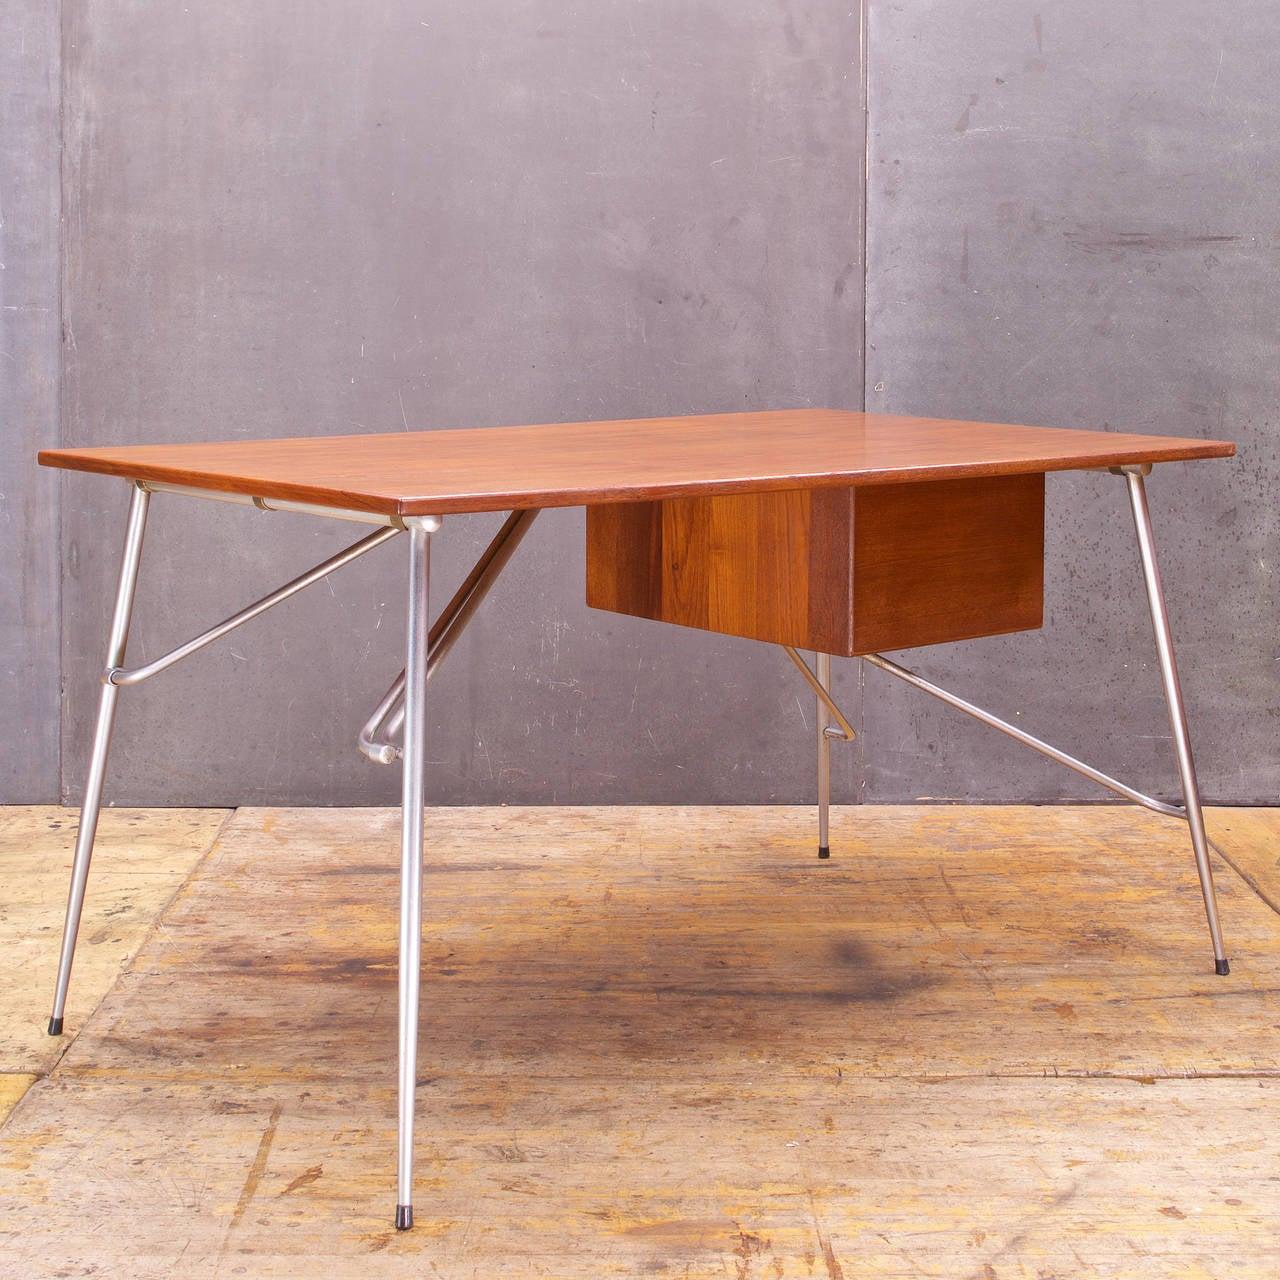 Scandinavian Modern Rare Borge Mogensen Teak and Steel Desk Vintage Mid-Century Soborg Mobler For Sale